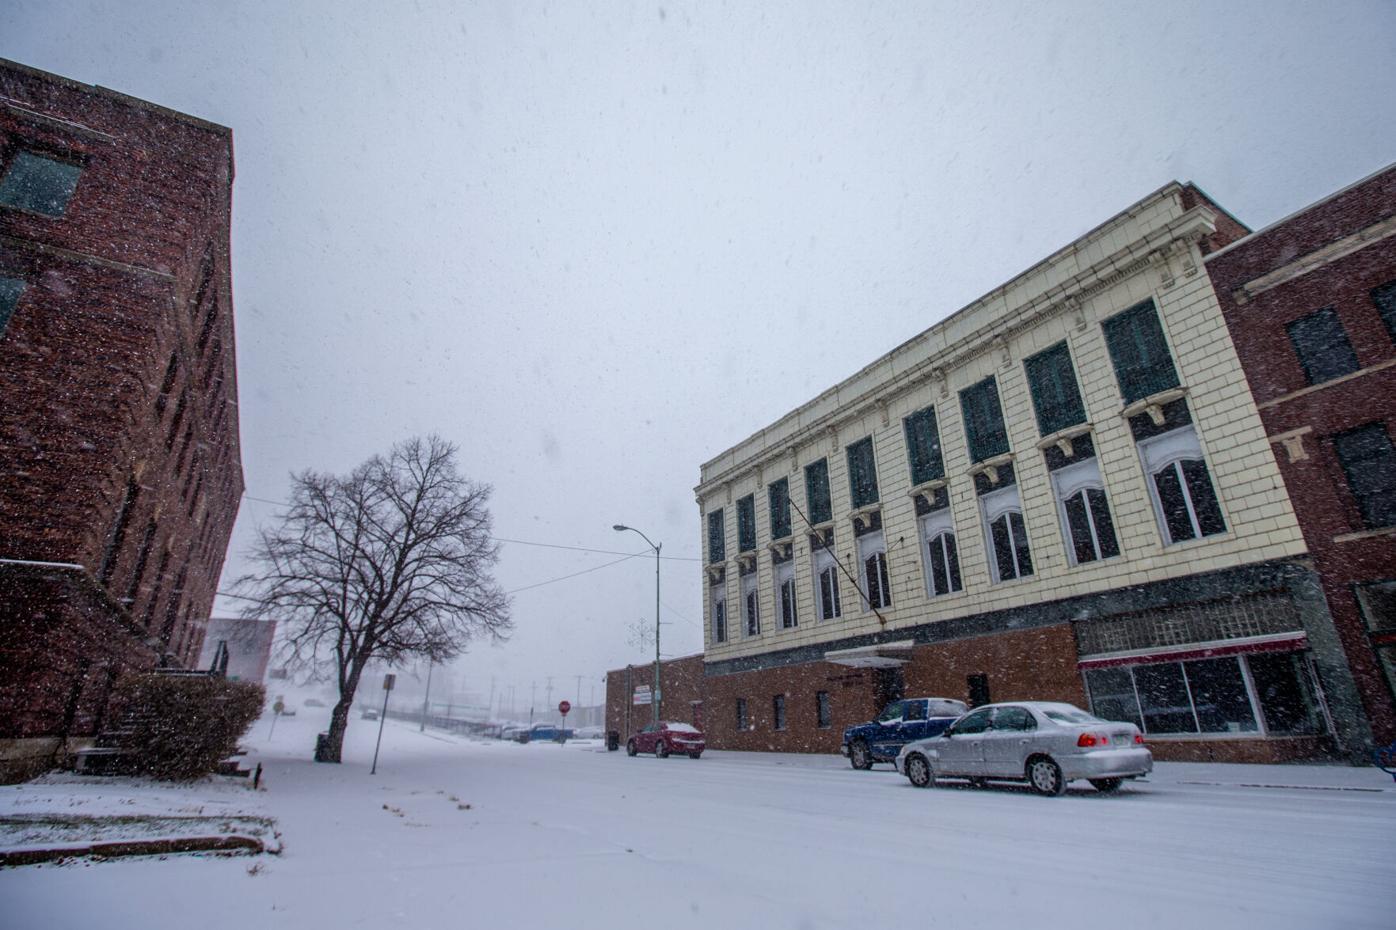 Snowfall Ottumwa 12/29/20